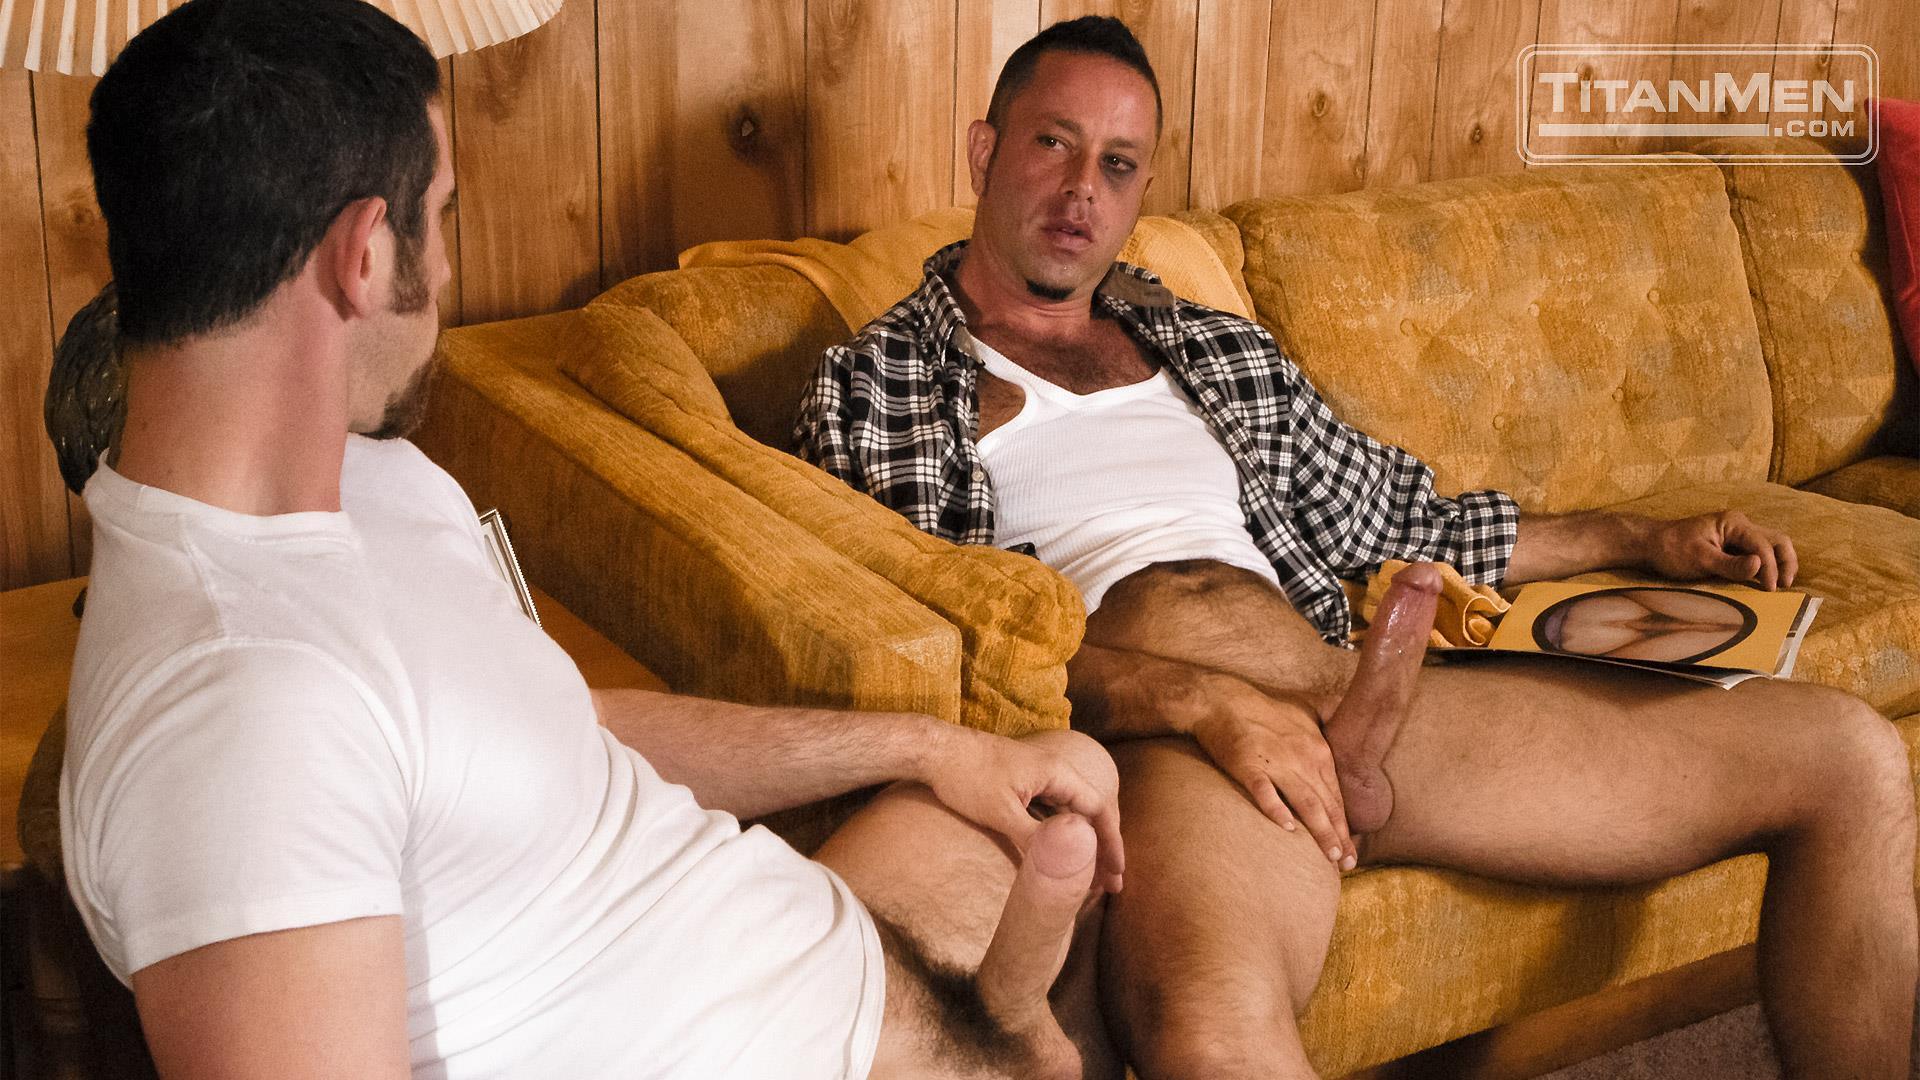 TitanMen-Joe-Gage-Rednecks-With-Big-Cocks-Amateur-Gay-Porn-39 Big Cock Rednecks From TitanMen and Joe Gage